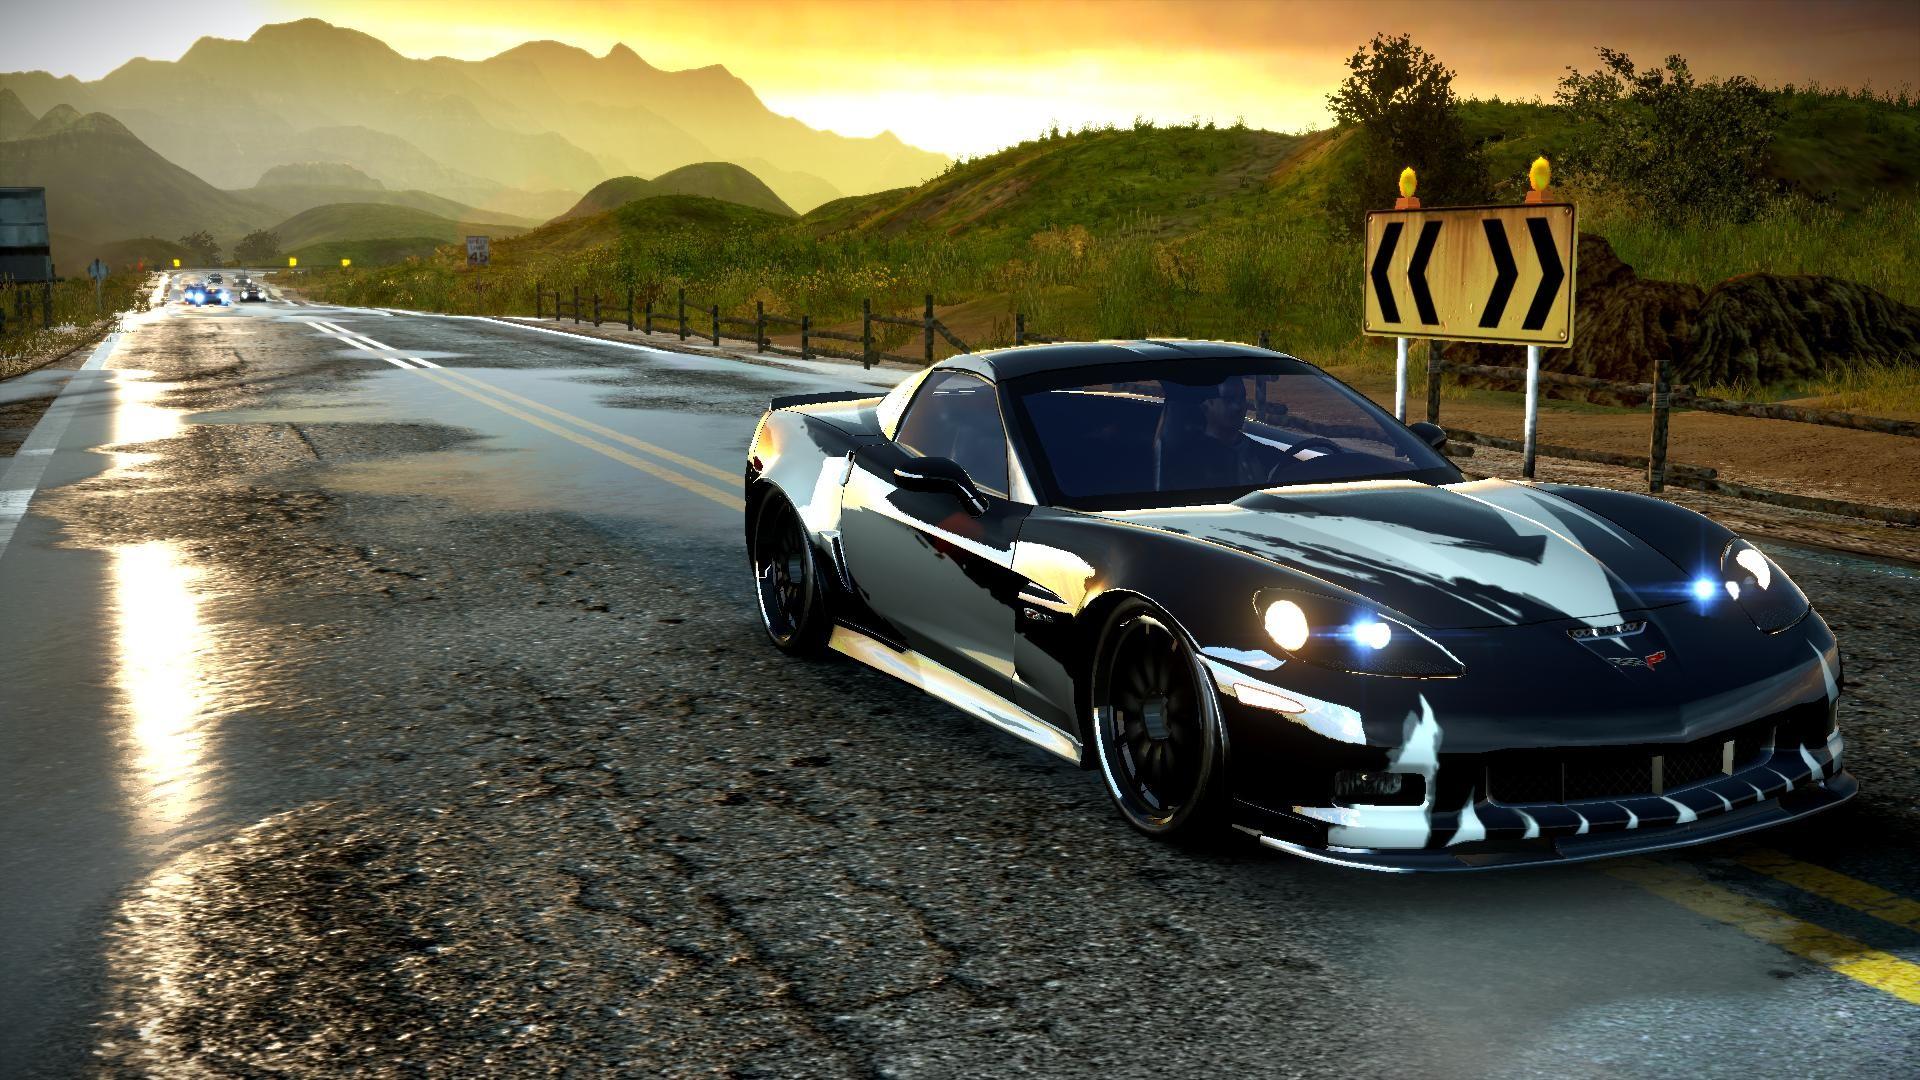 C5 Corvette Wallpaper (58+ images)